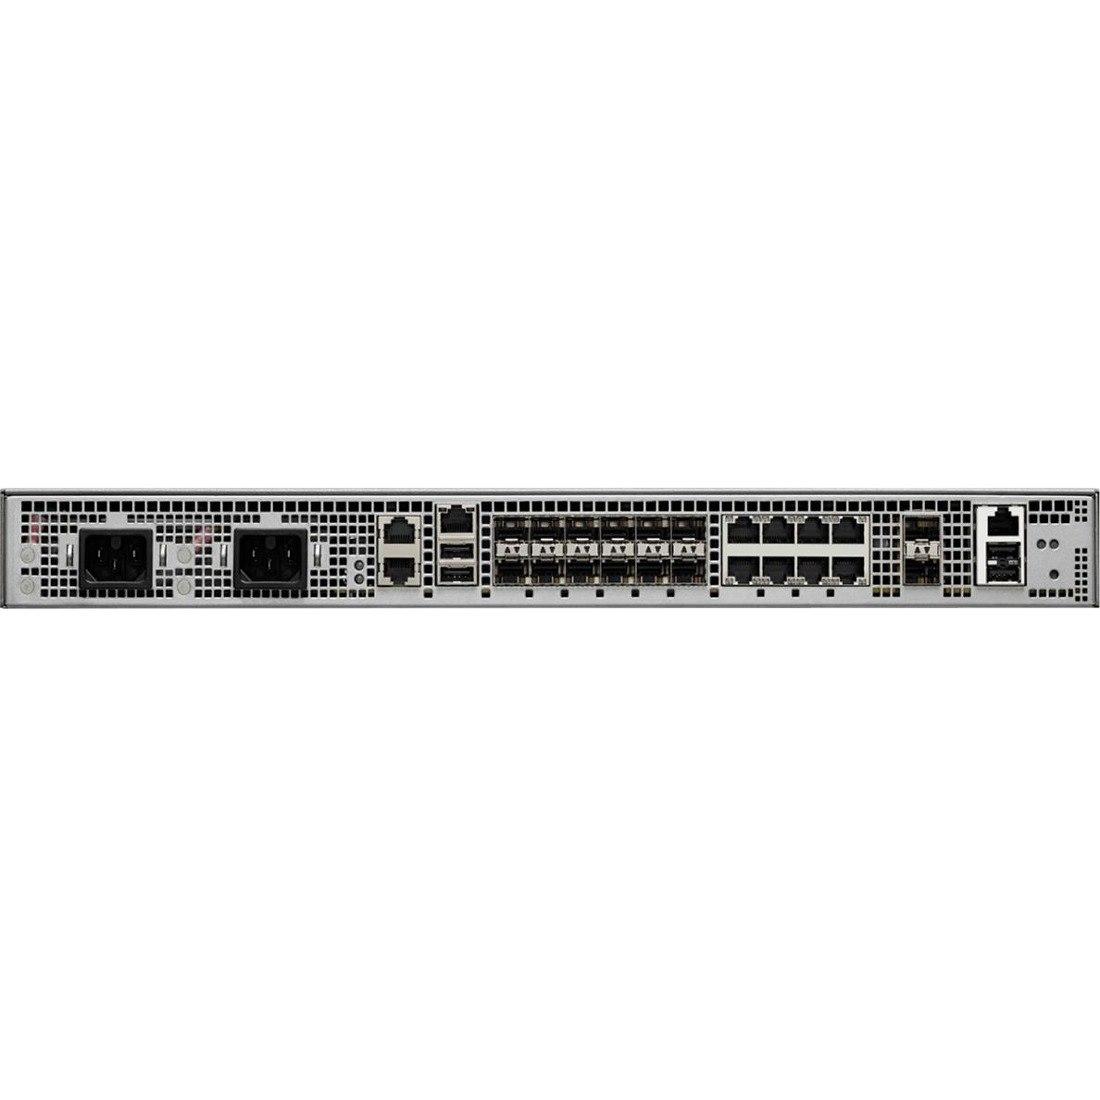 Cisco ASR-920-12CZ-A Router